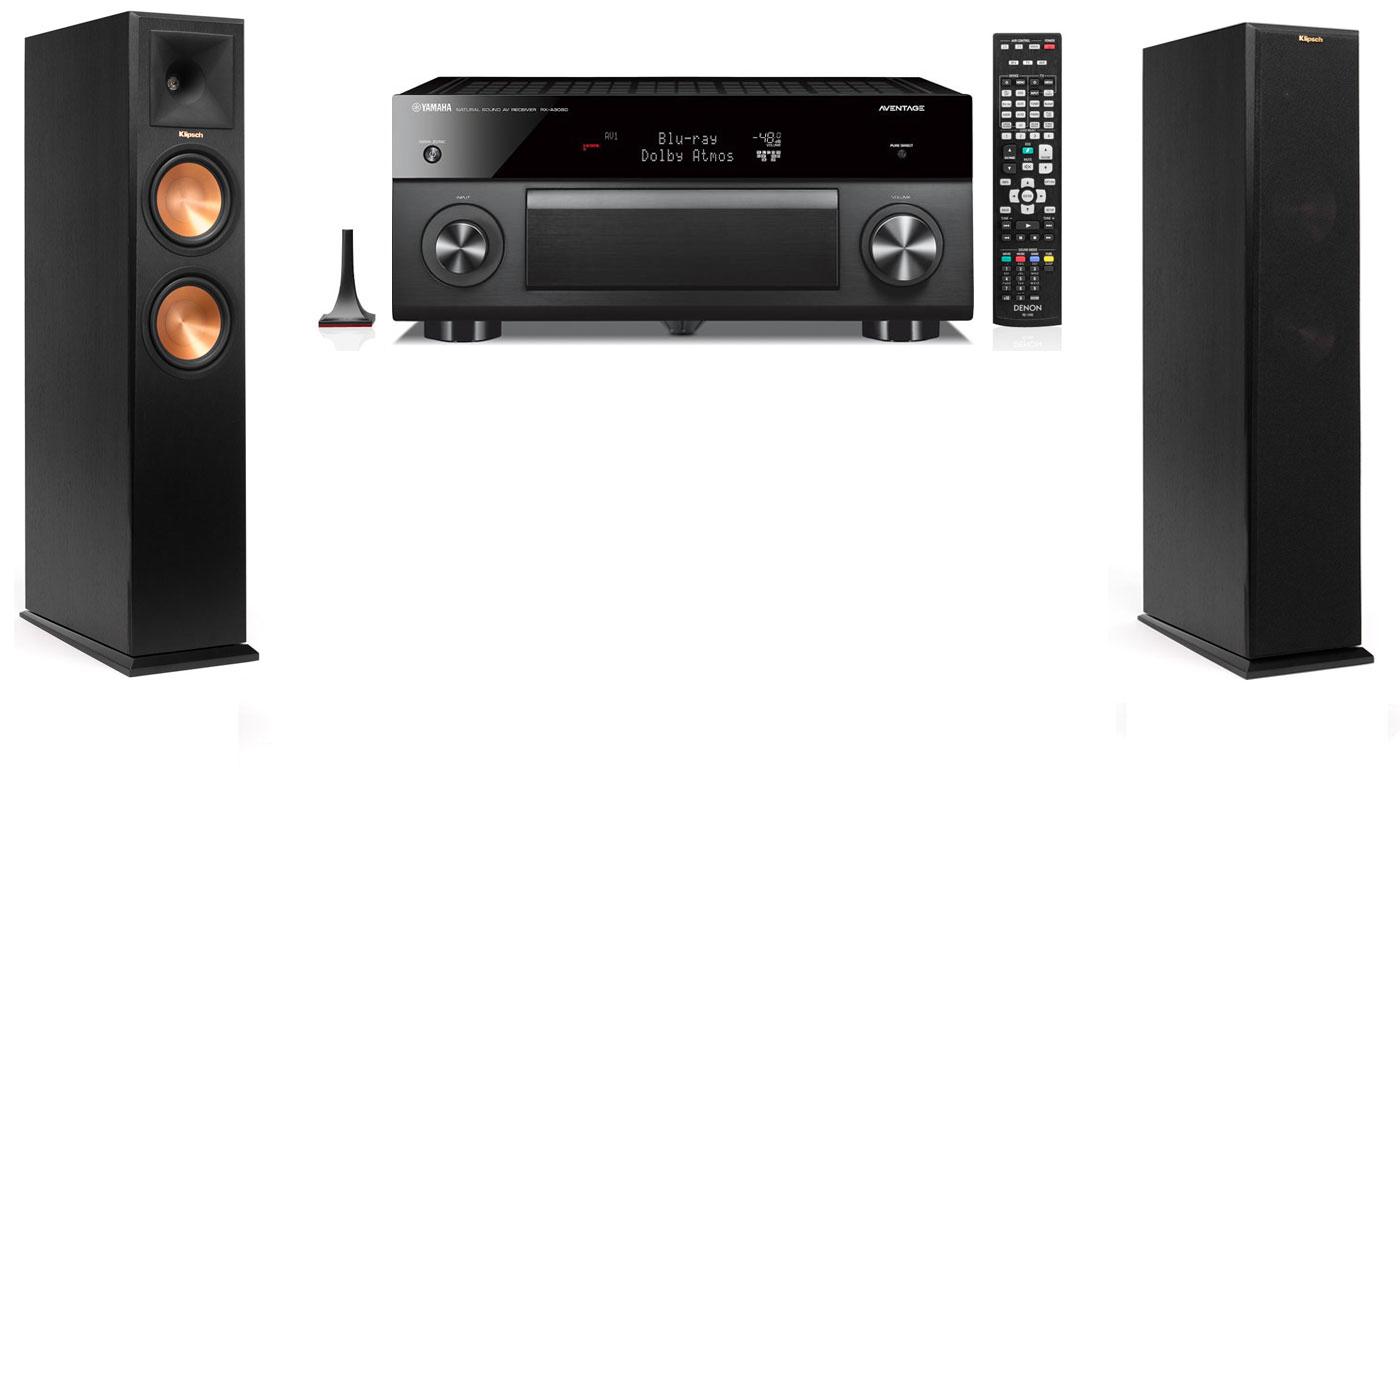 Best Buy Polk Yamaha Center Channel